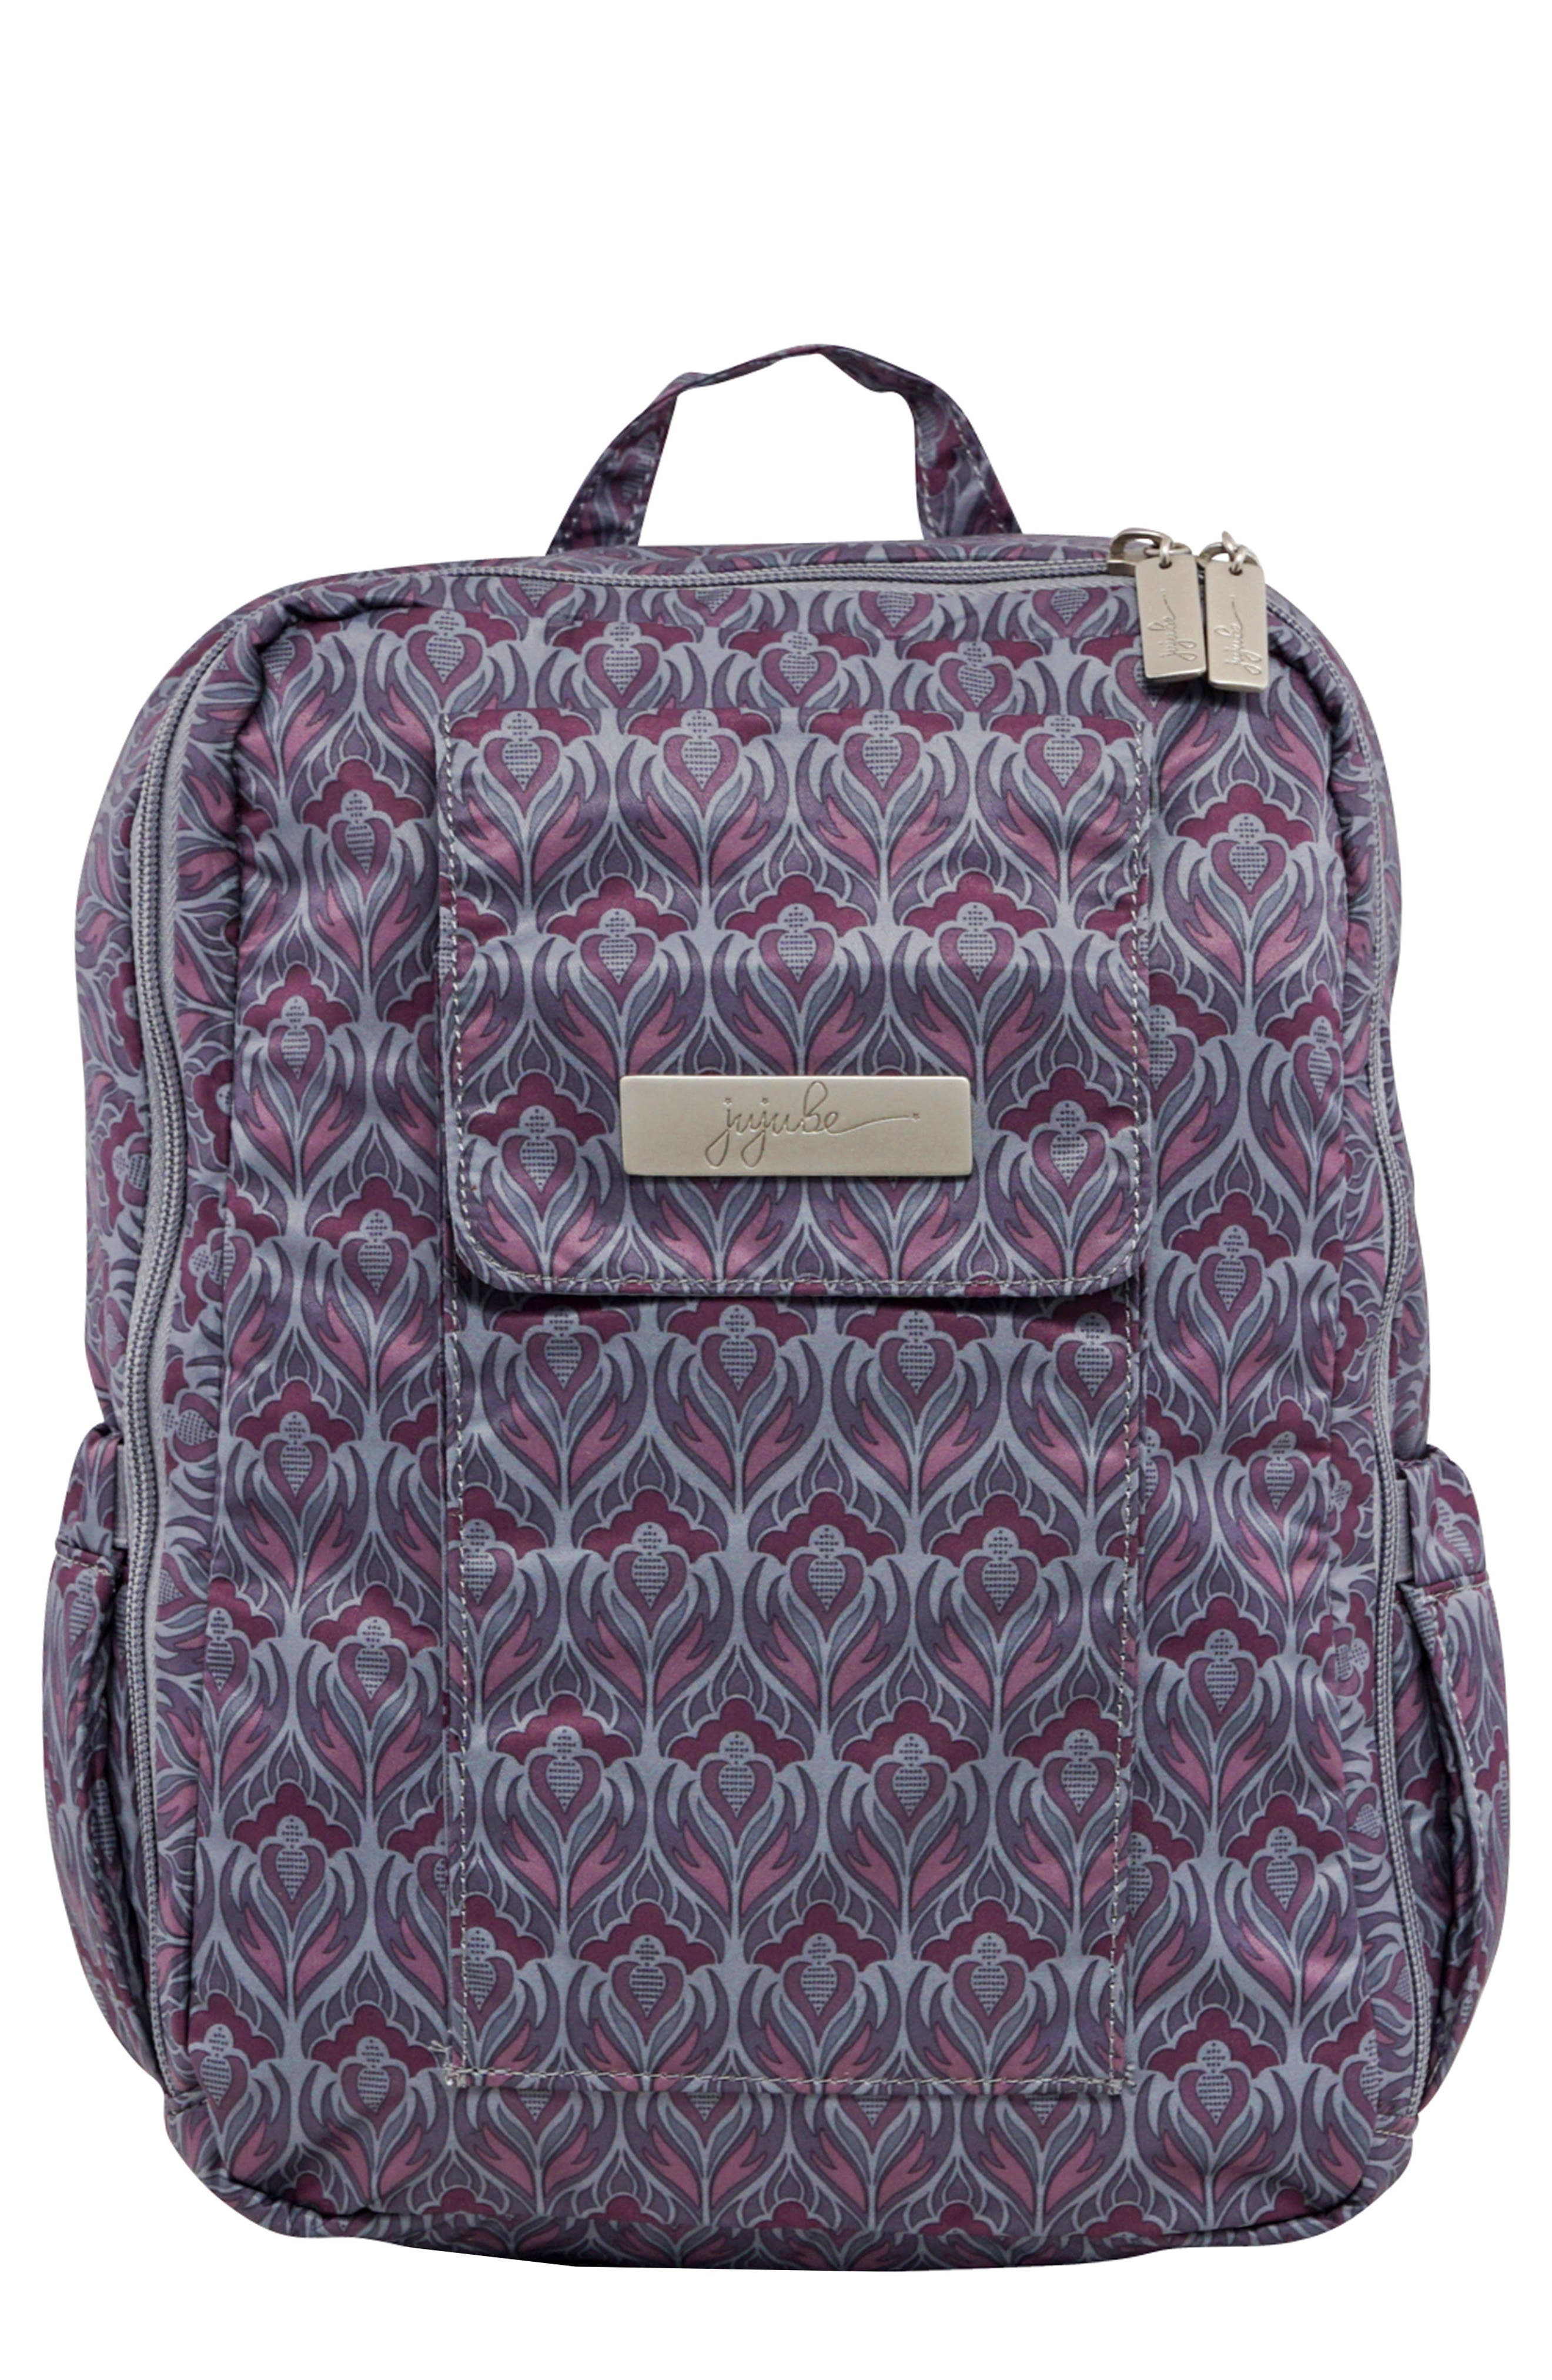 'Mini Be' Backpack,                             Main thumbnail 1, color,                             020